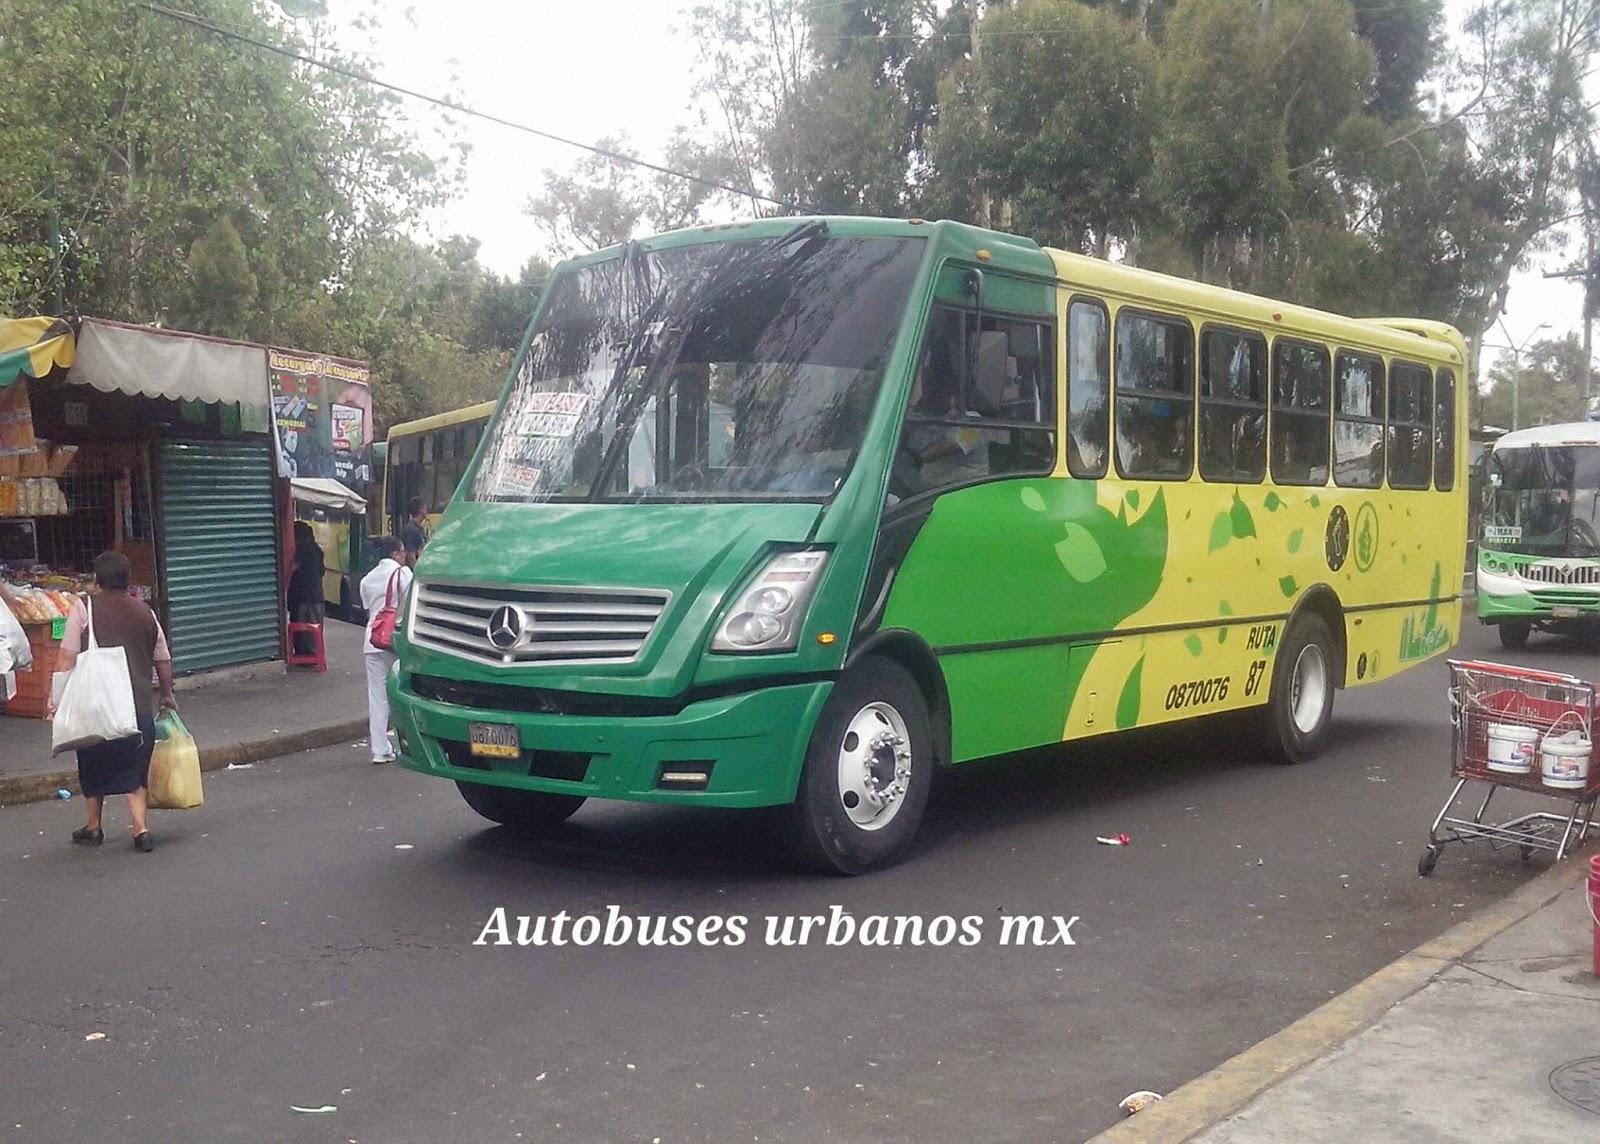 Autobuses urbanos ciudad de mexico mercedes benz eurocar for Www mercedes benz mexico